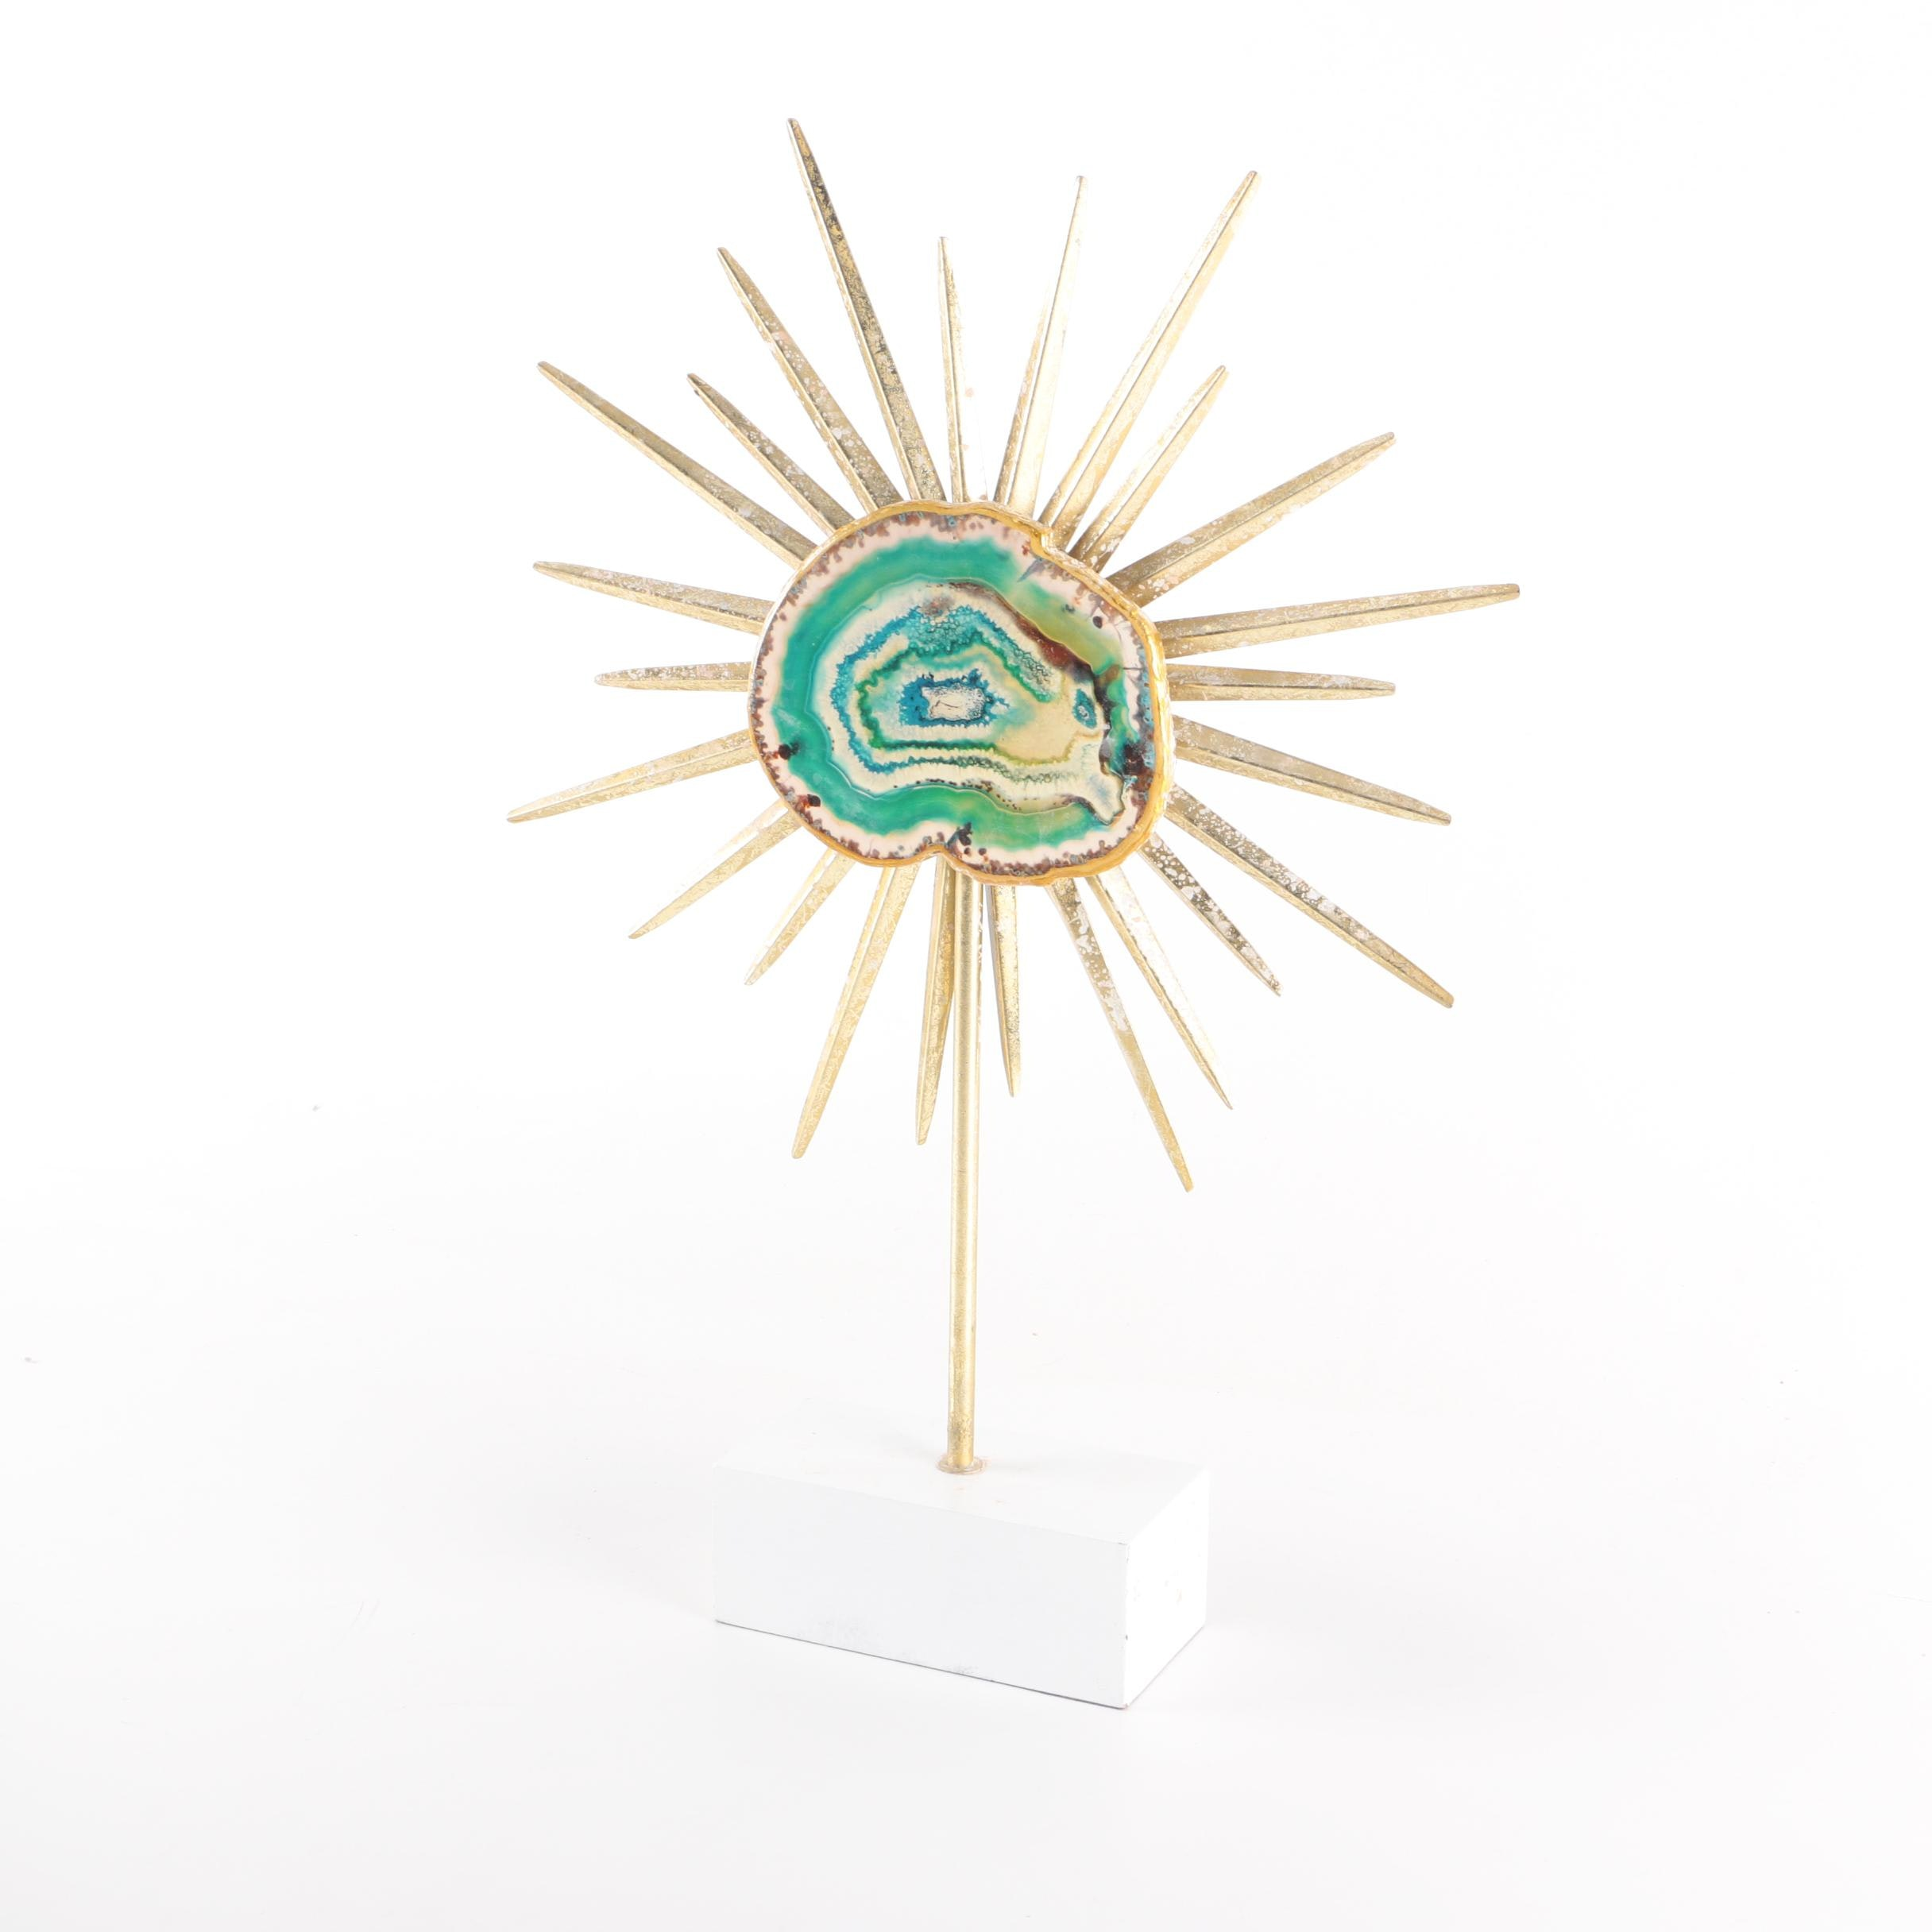 Gold Tone Starburst Table Sculpture